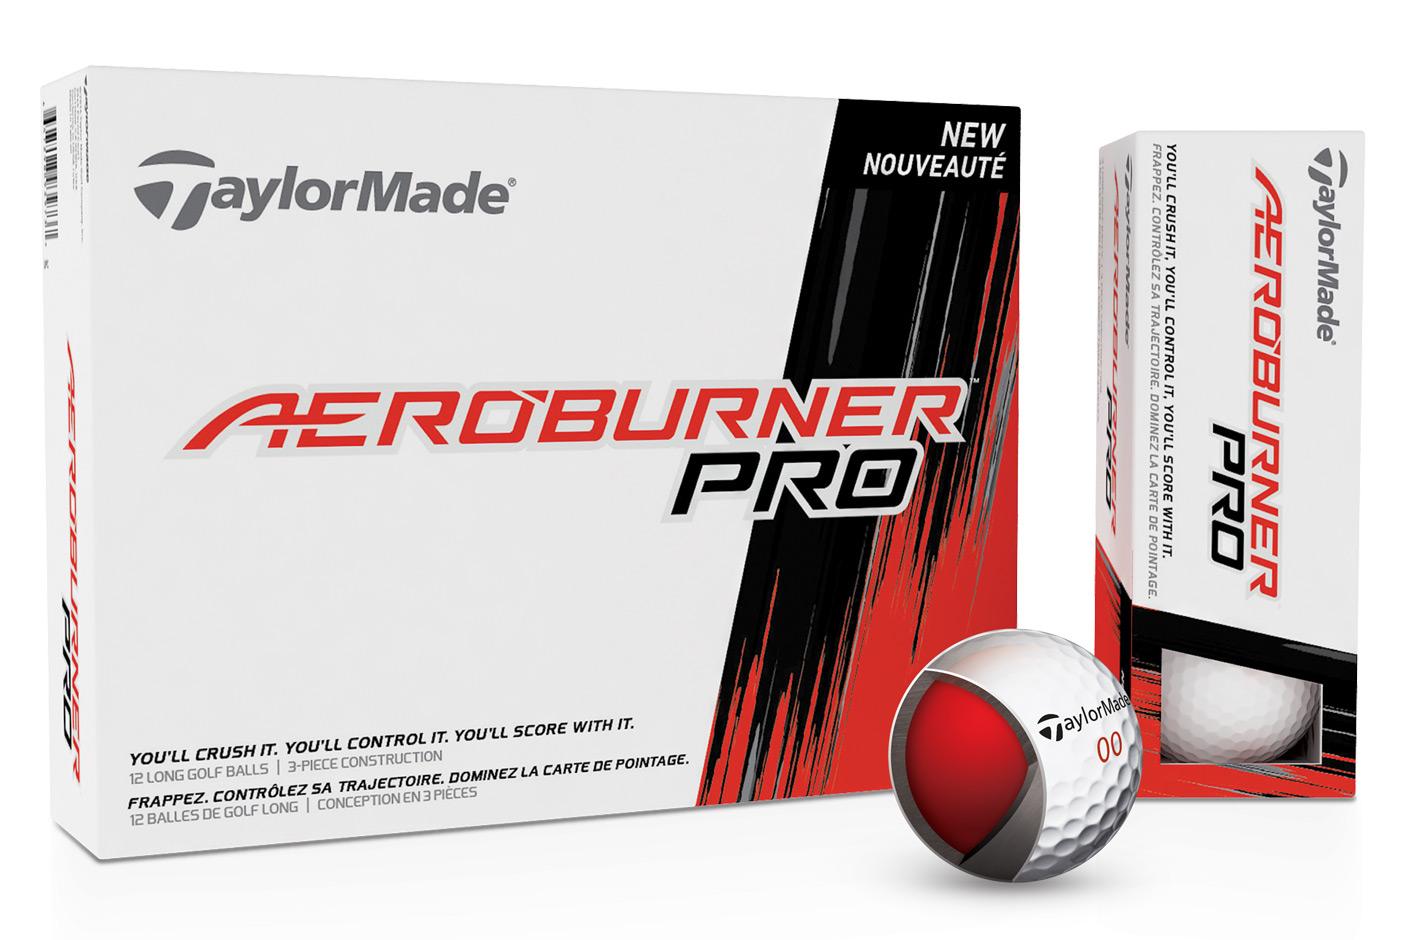 The new three-piece TaylorMade AeroBurner Pro ball